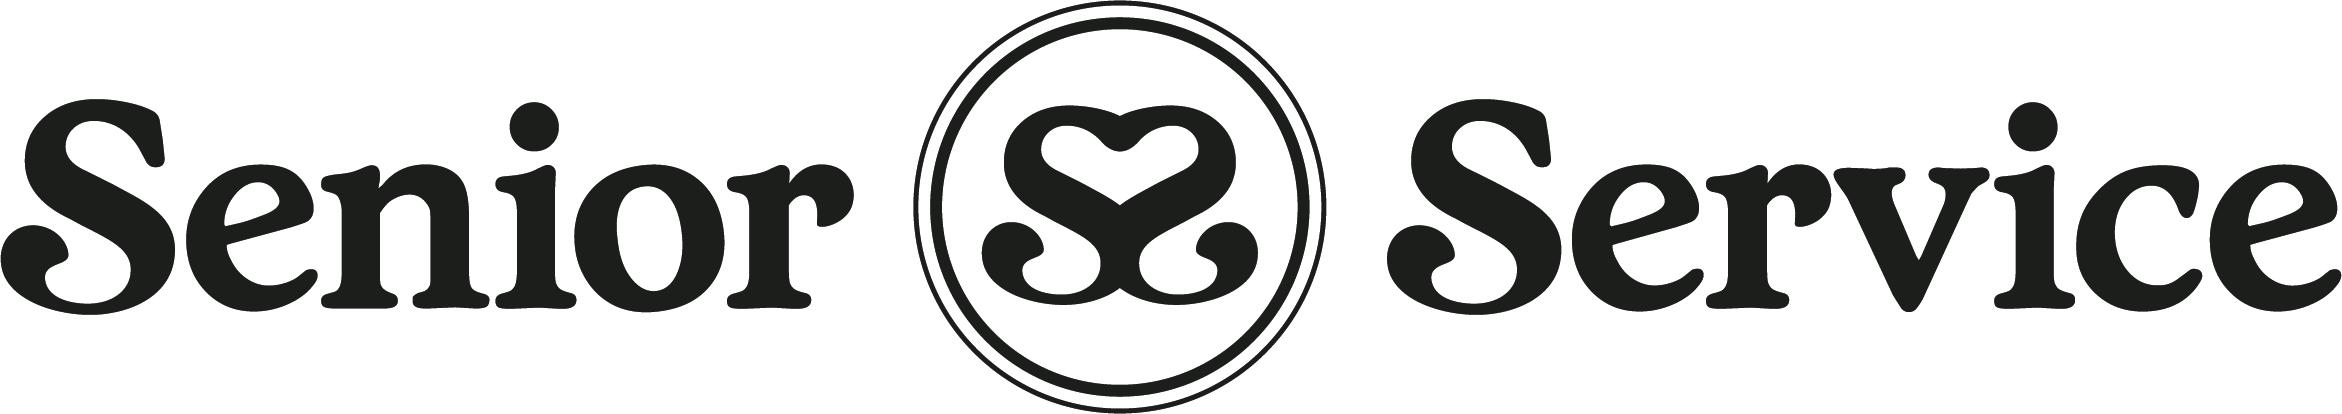 Senior Service logo